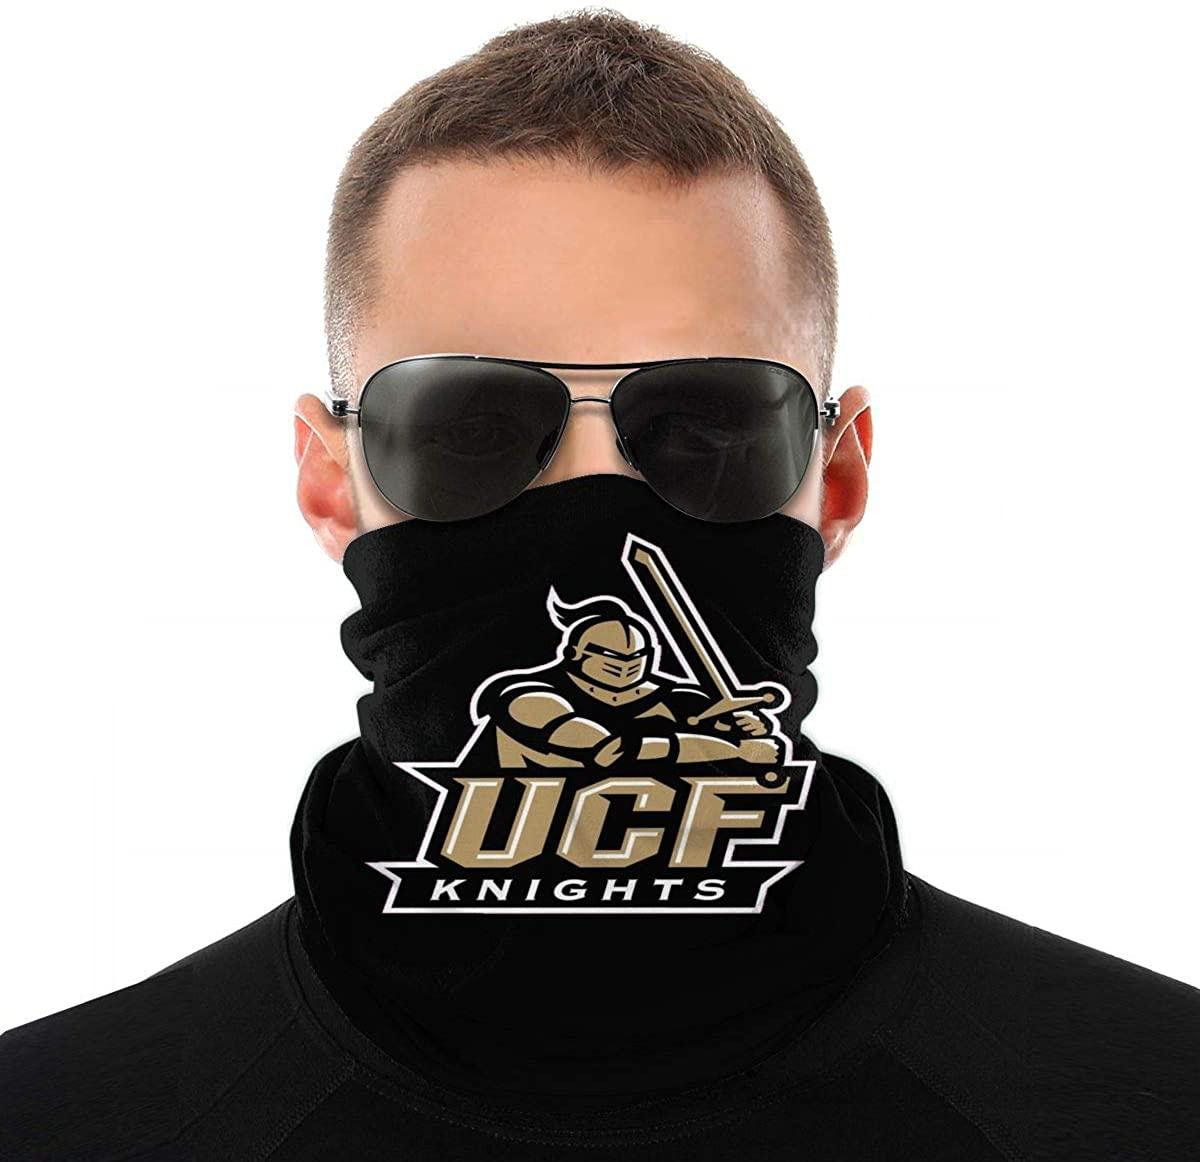 Headband Bandana - Neck Gaiter, Face Scarf, Balaclava, Headwrap Elastic Face Mask for Men and Women